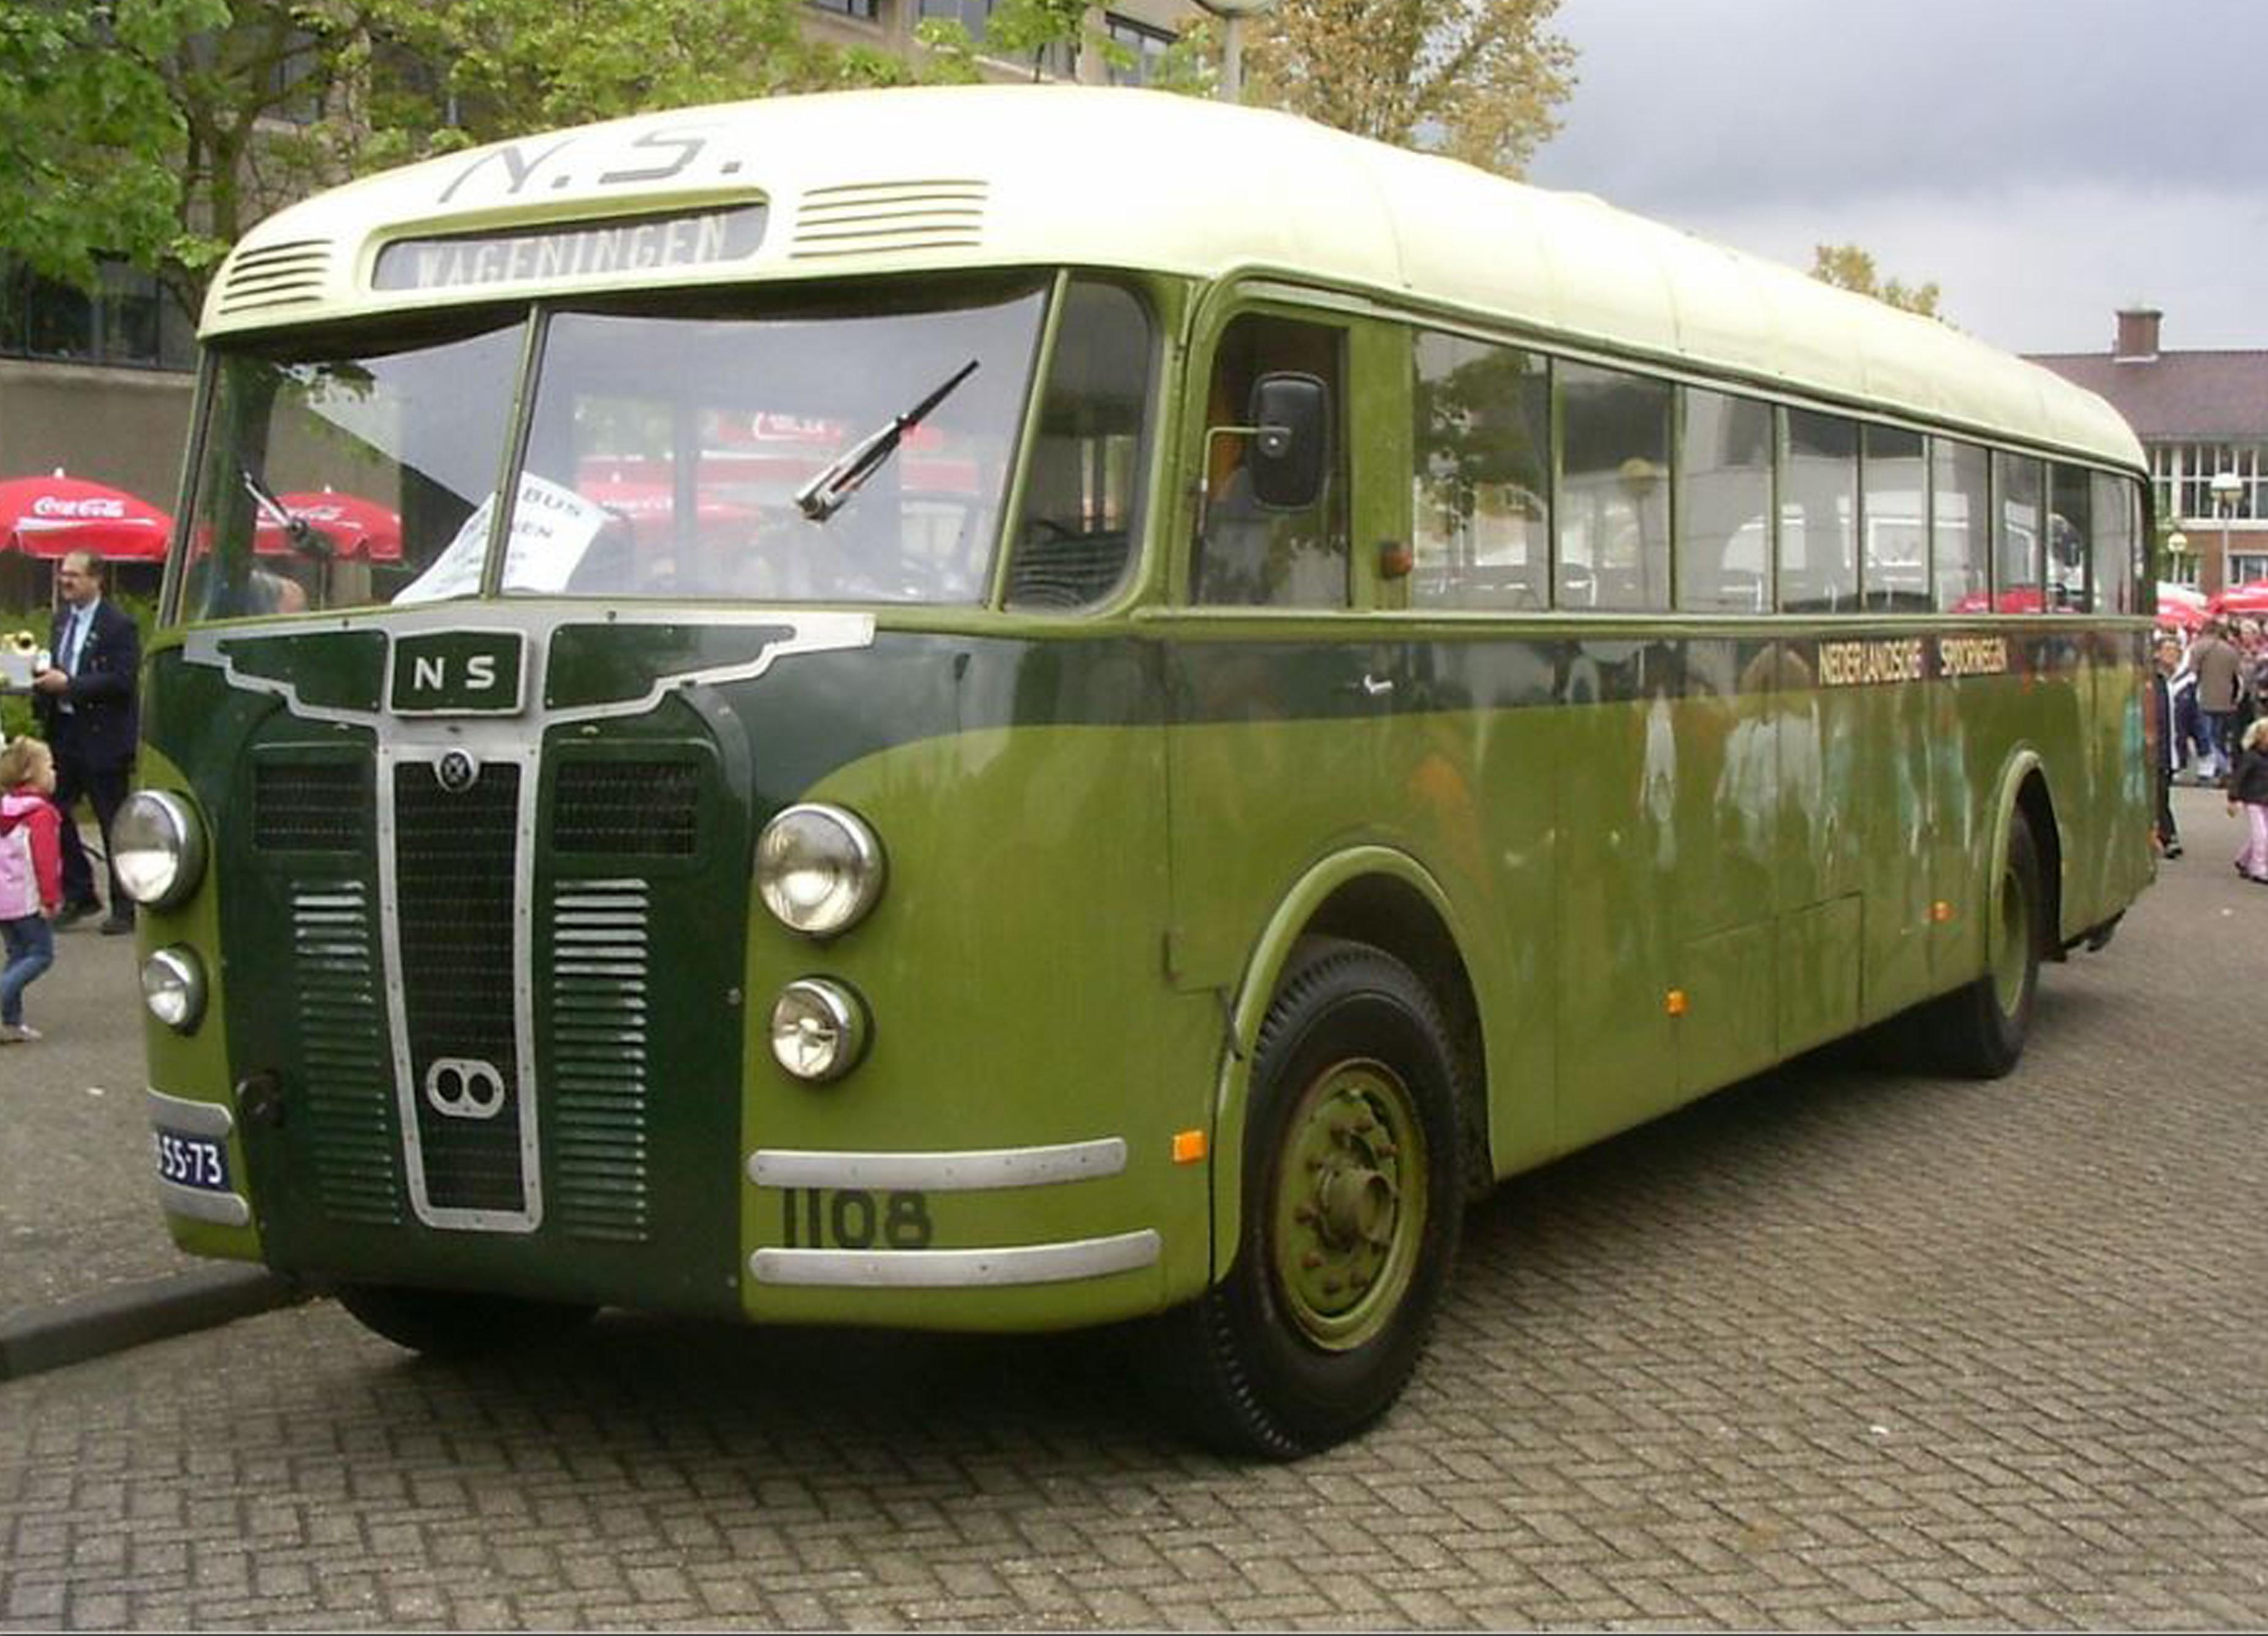 Crossleys-NB-55-46-Type-NS-1108-(3)